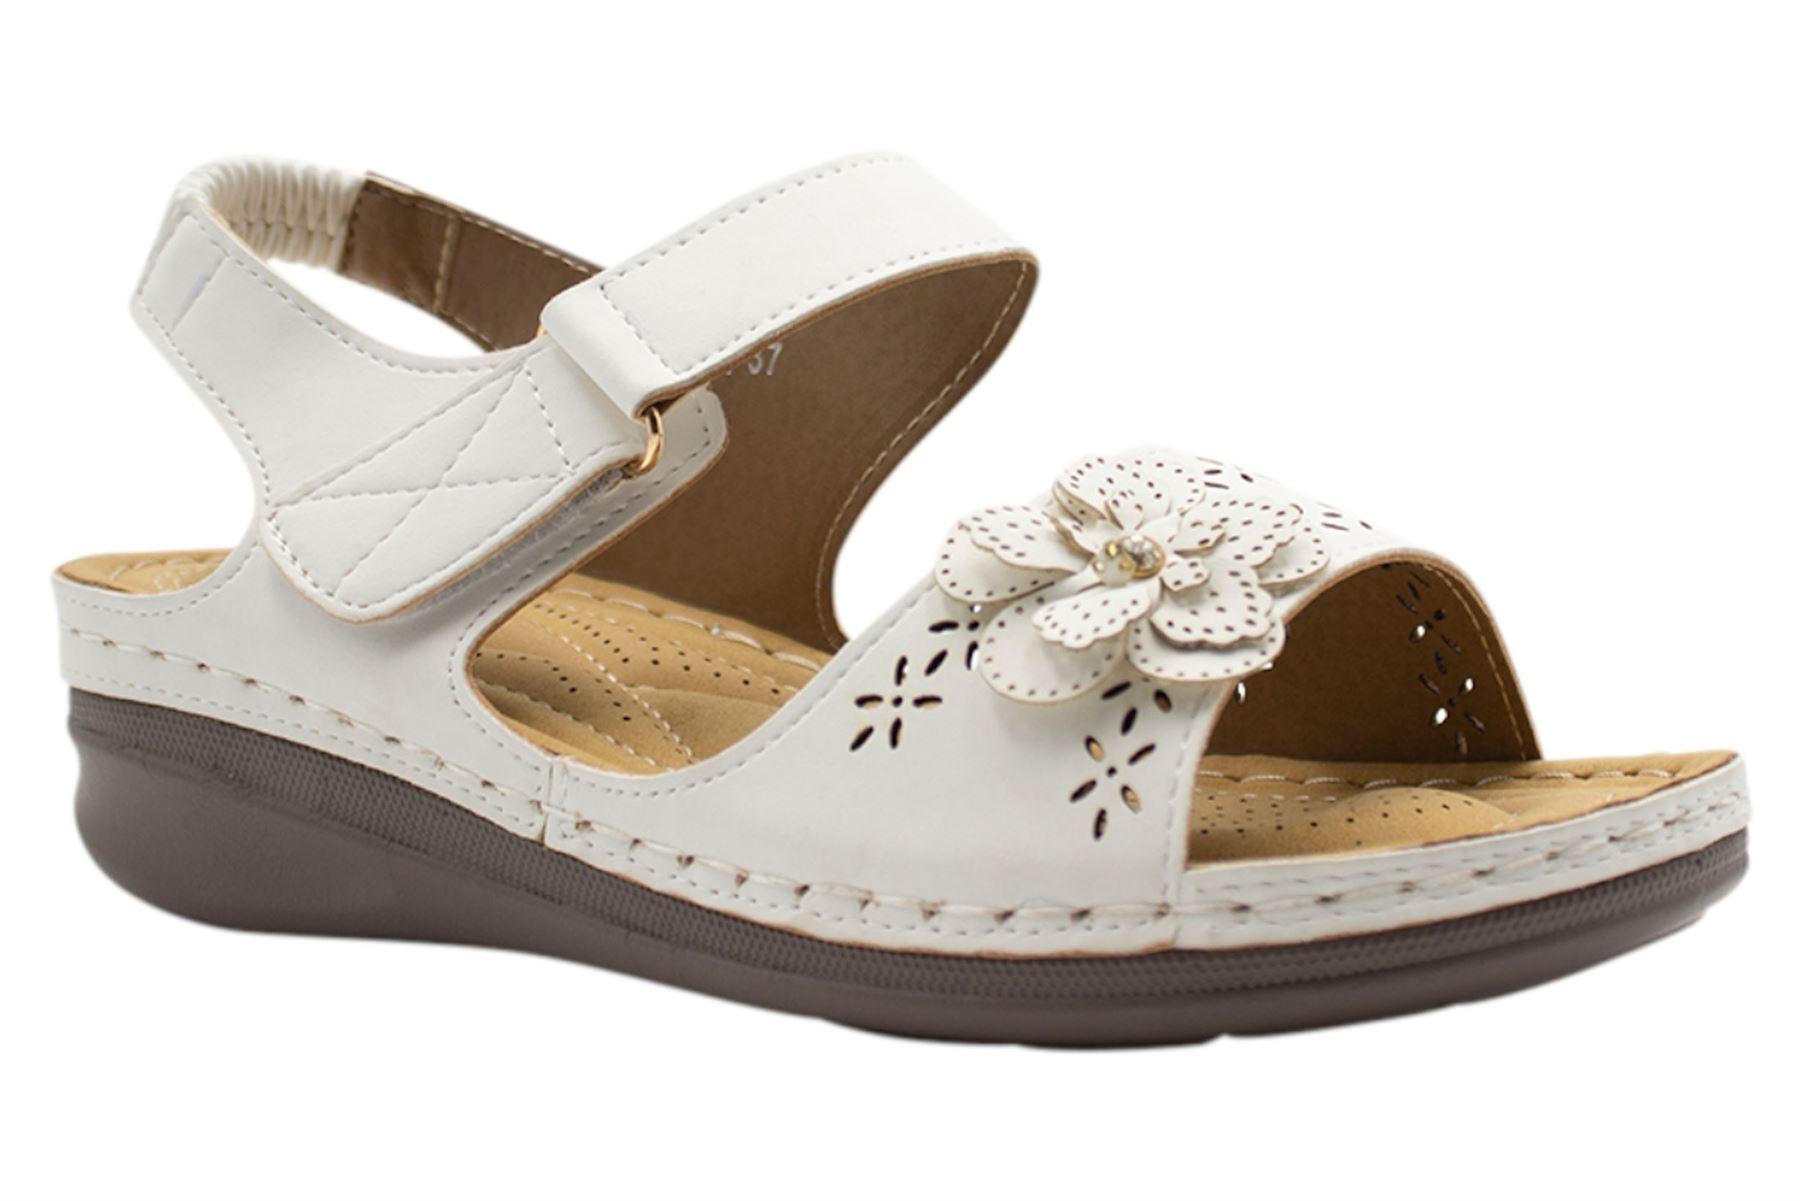 Ladies-Sandals-Womens-Mid-Heel-Comfort-Summer-Beach-Casual-Wear miniatura 40